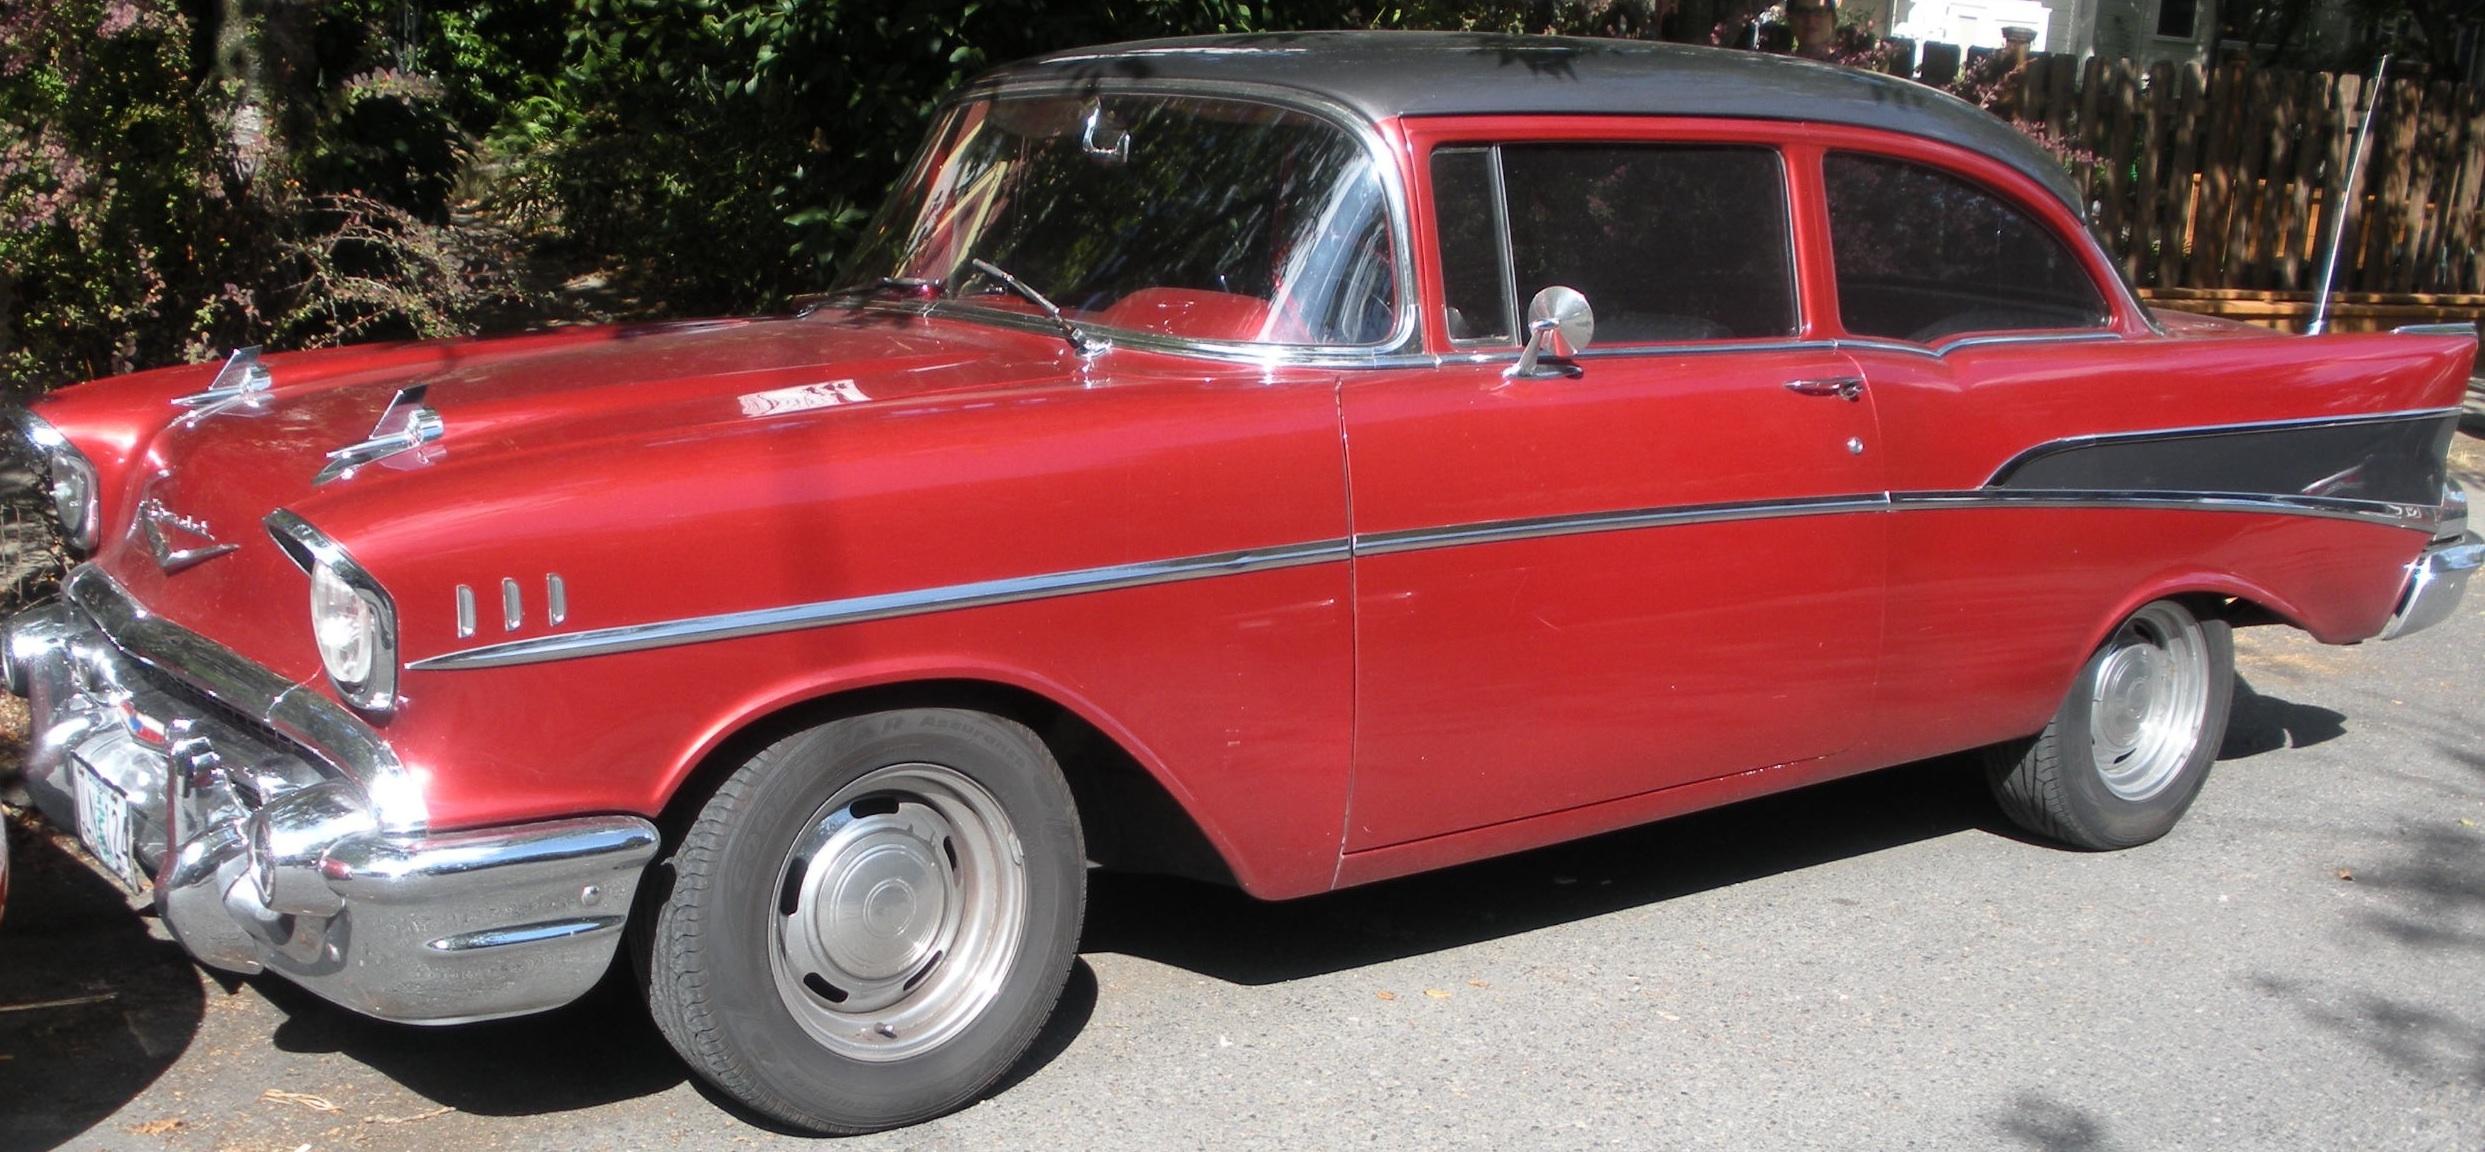 434k: 1957 chevrolet